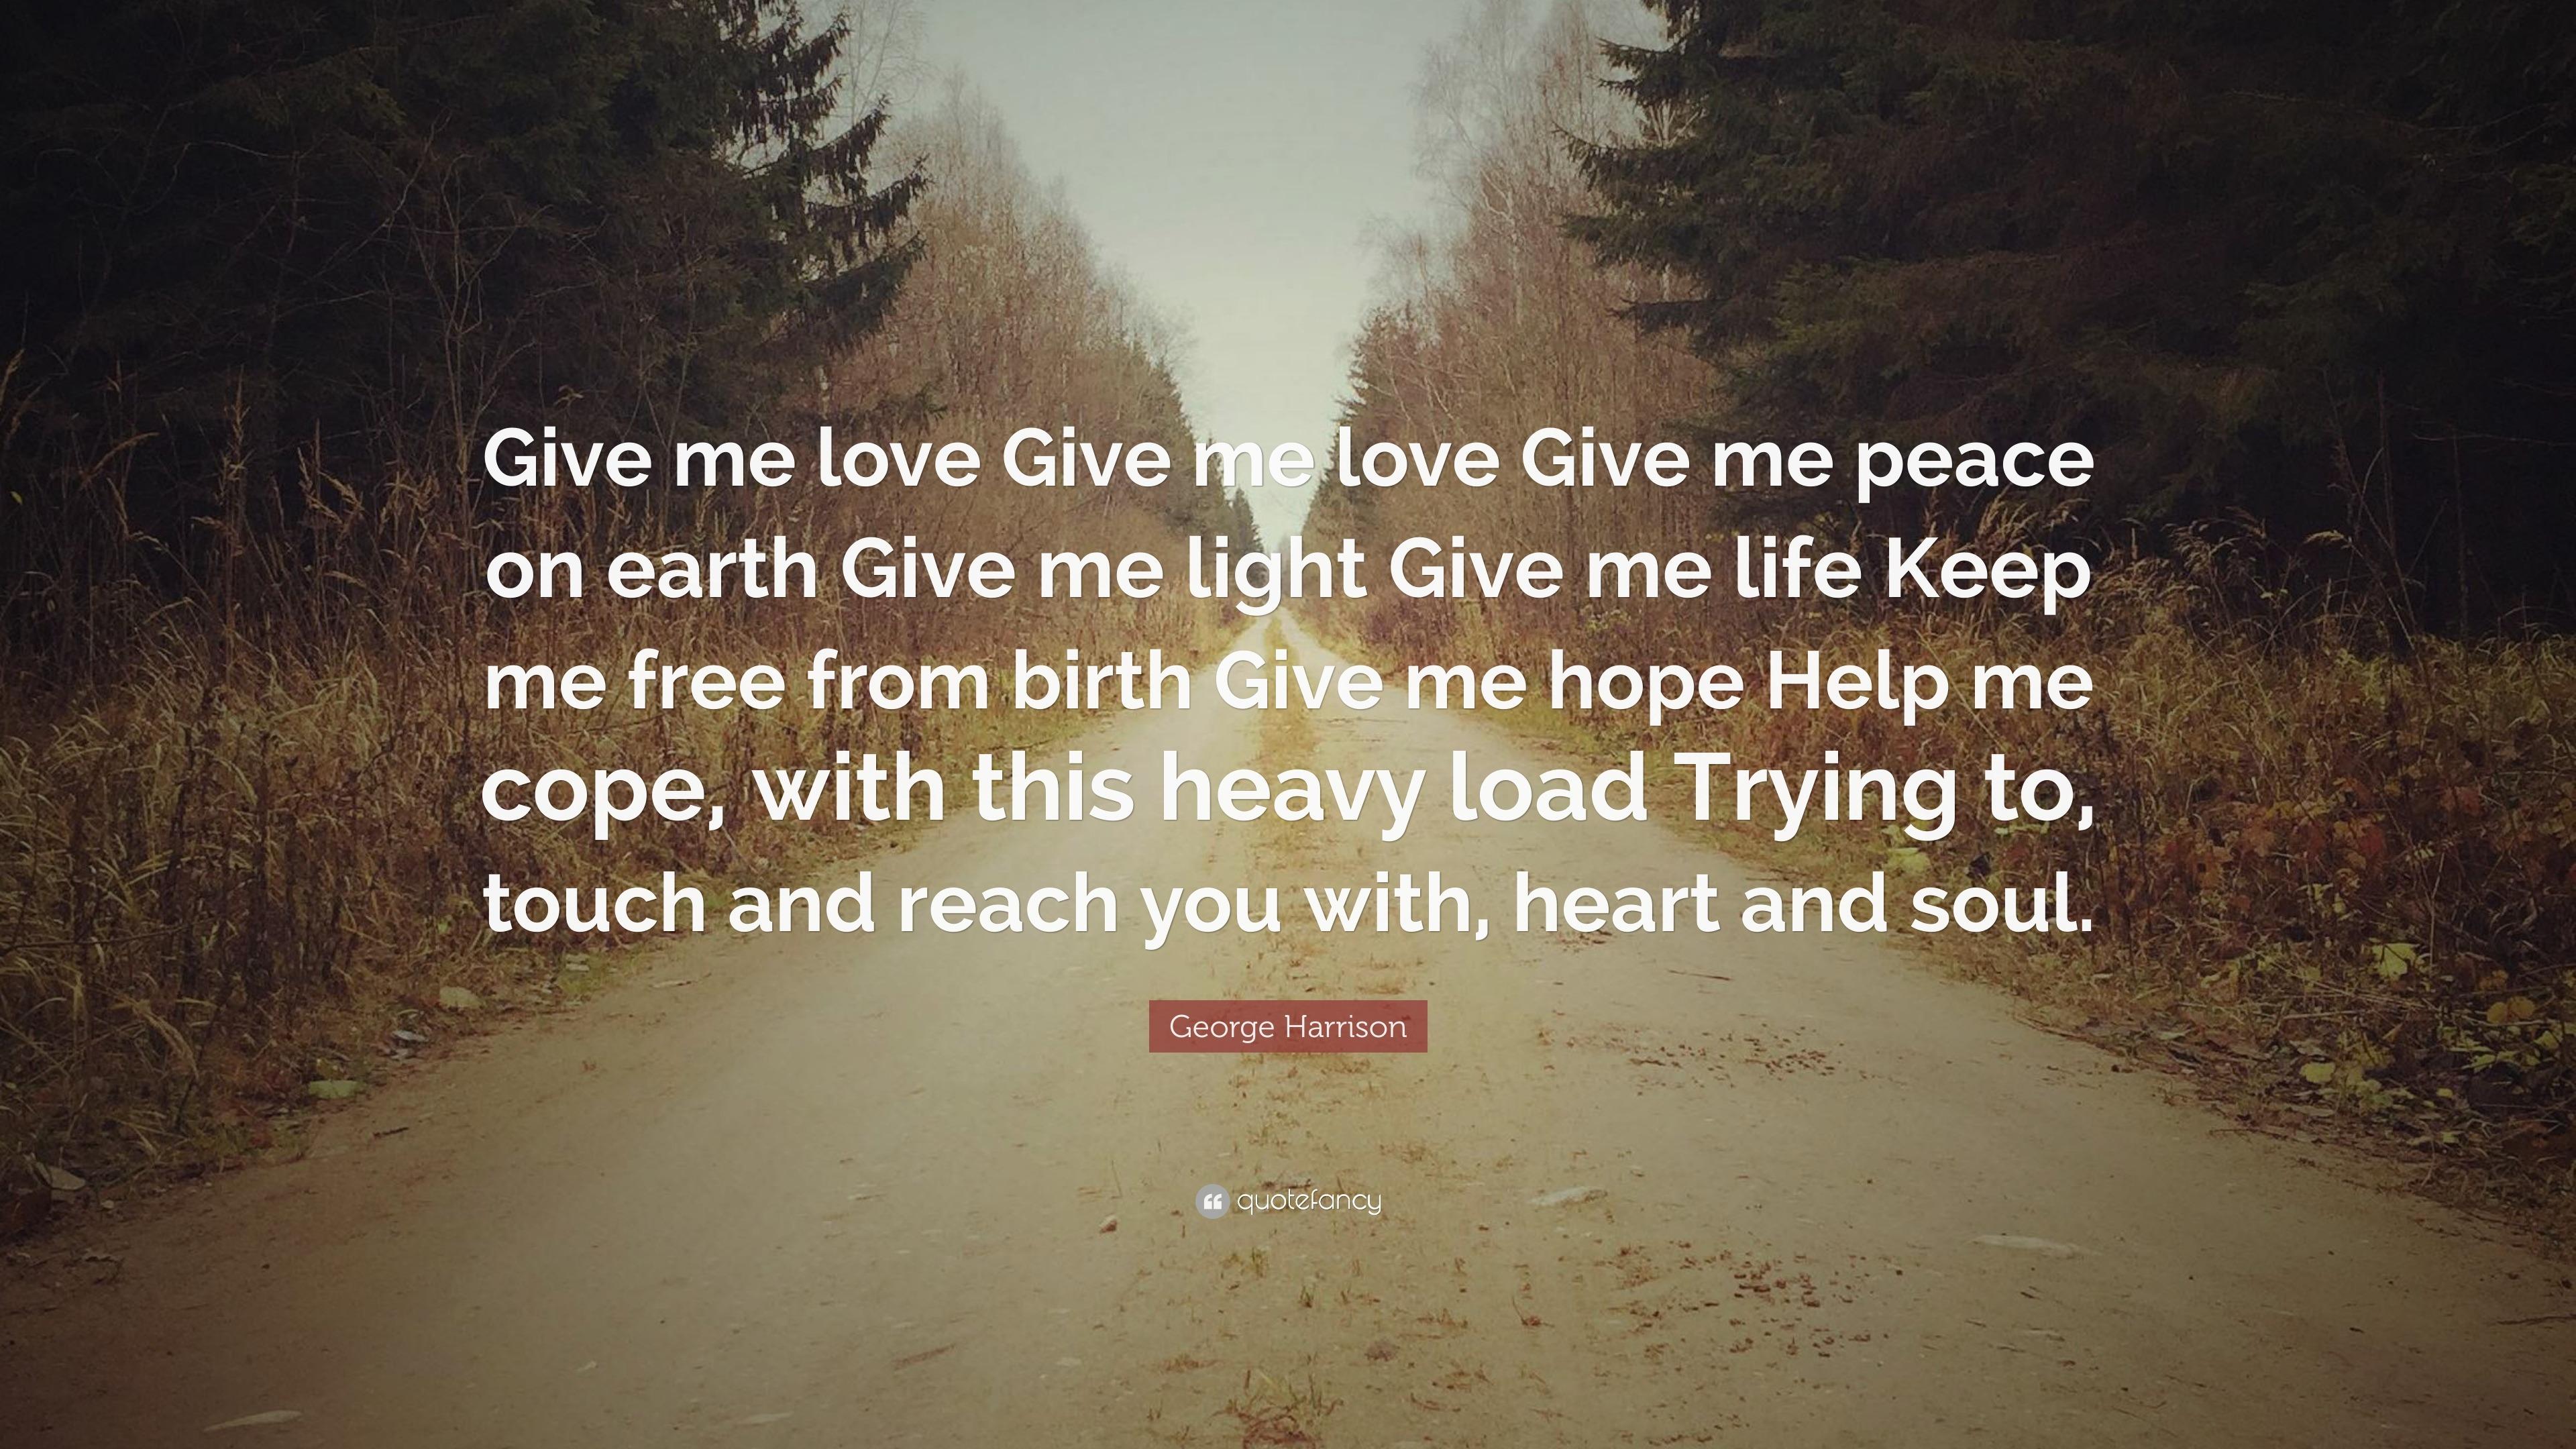 Wonderful George Harrison Quote: U201cGive Me Love Give Me Love Give Me Peace On Earth